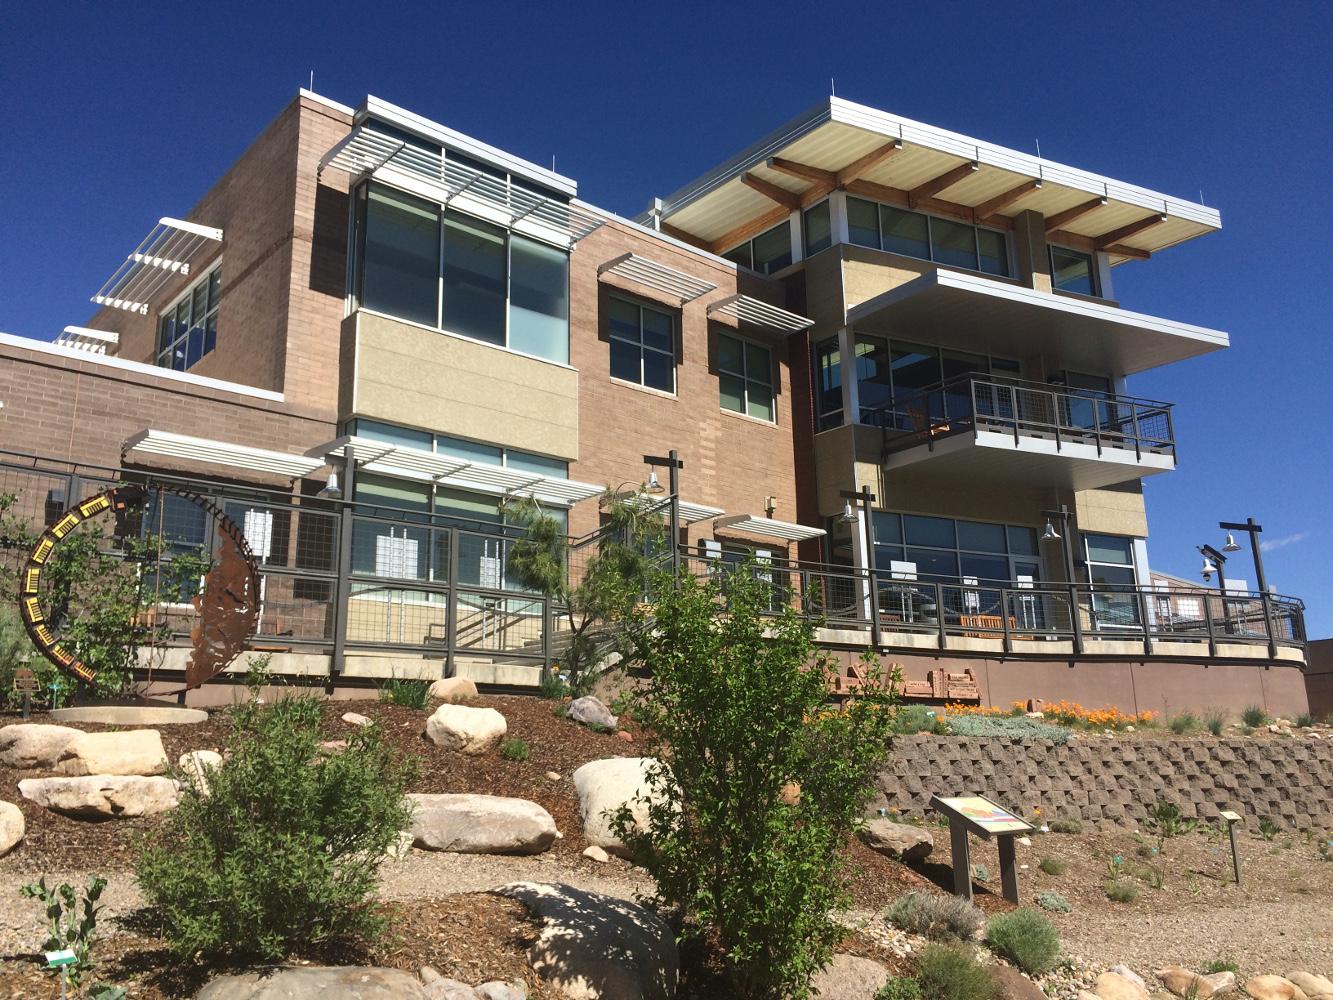 Durango Library 1